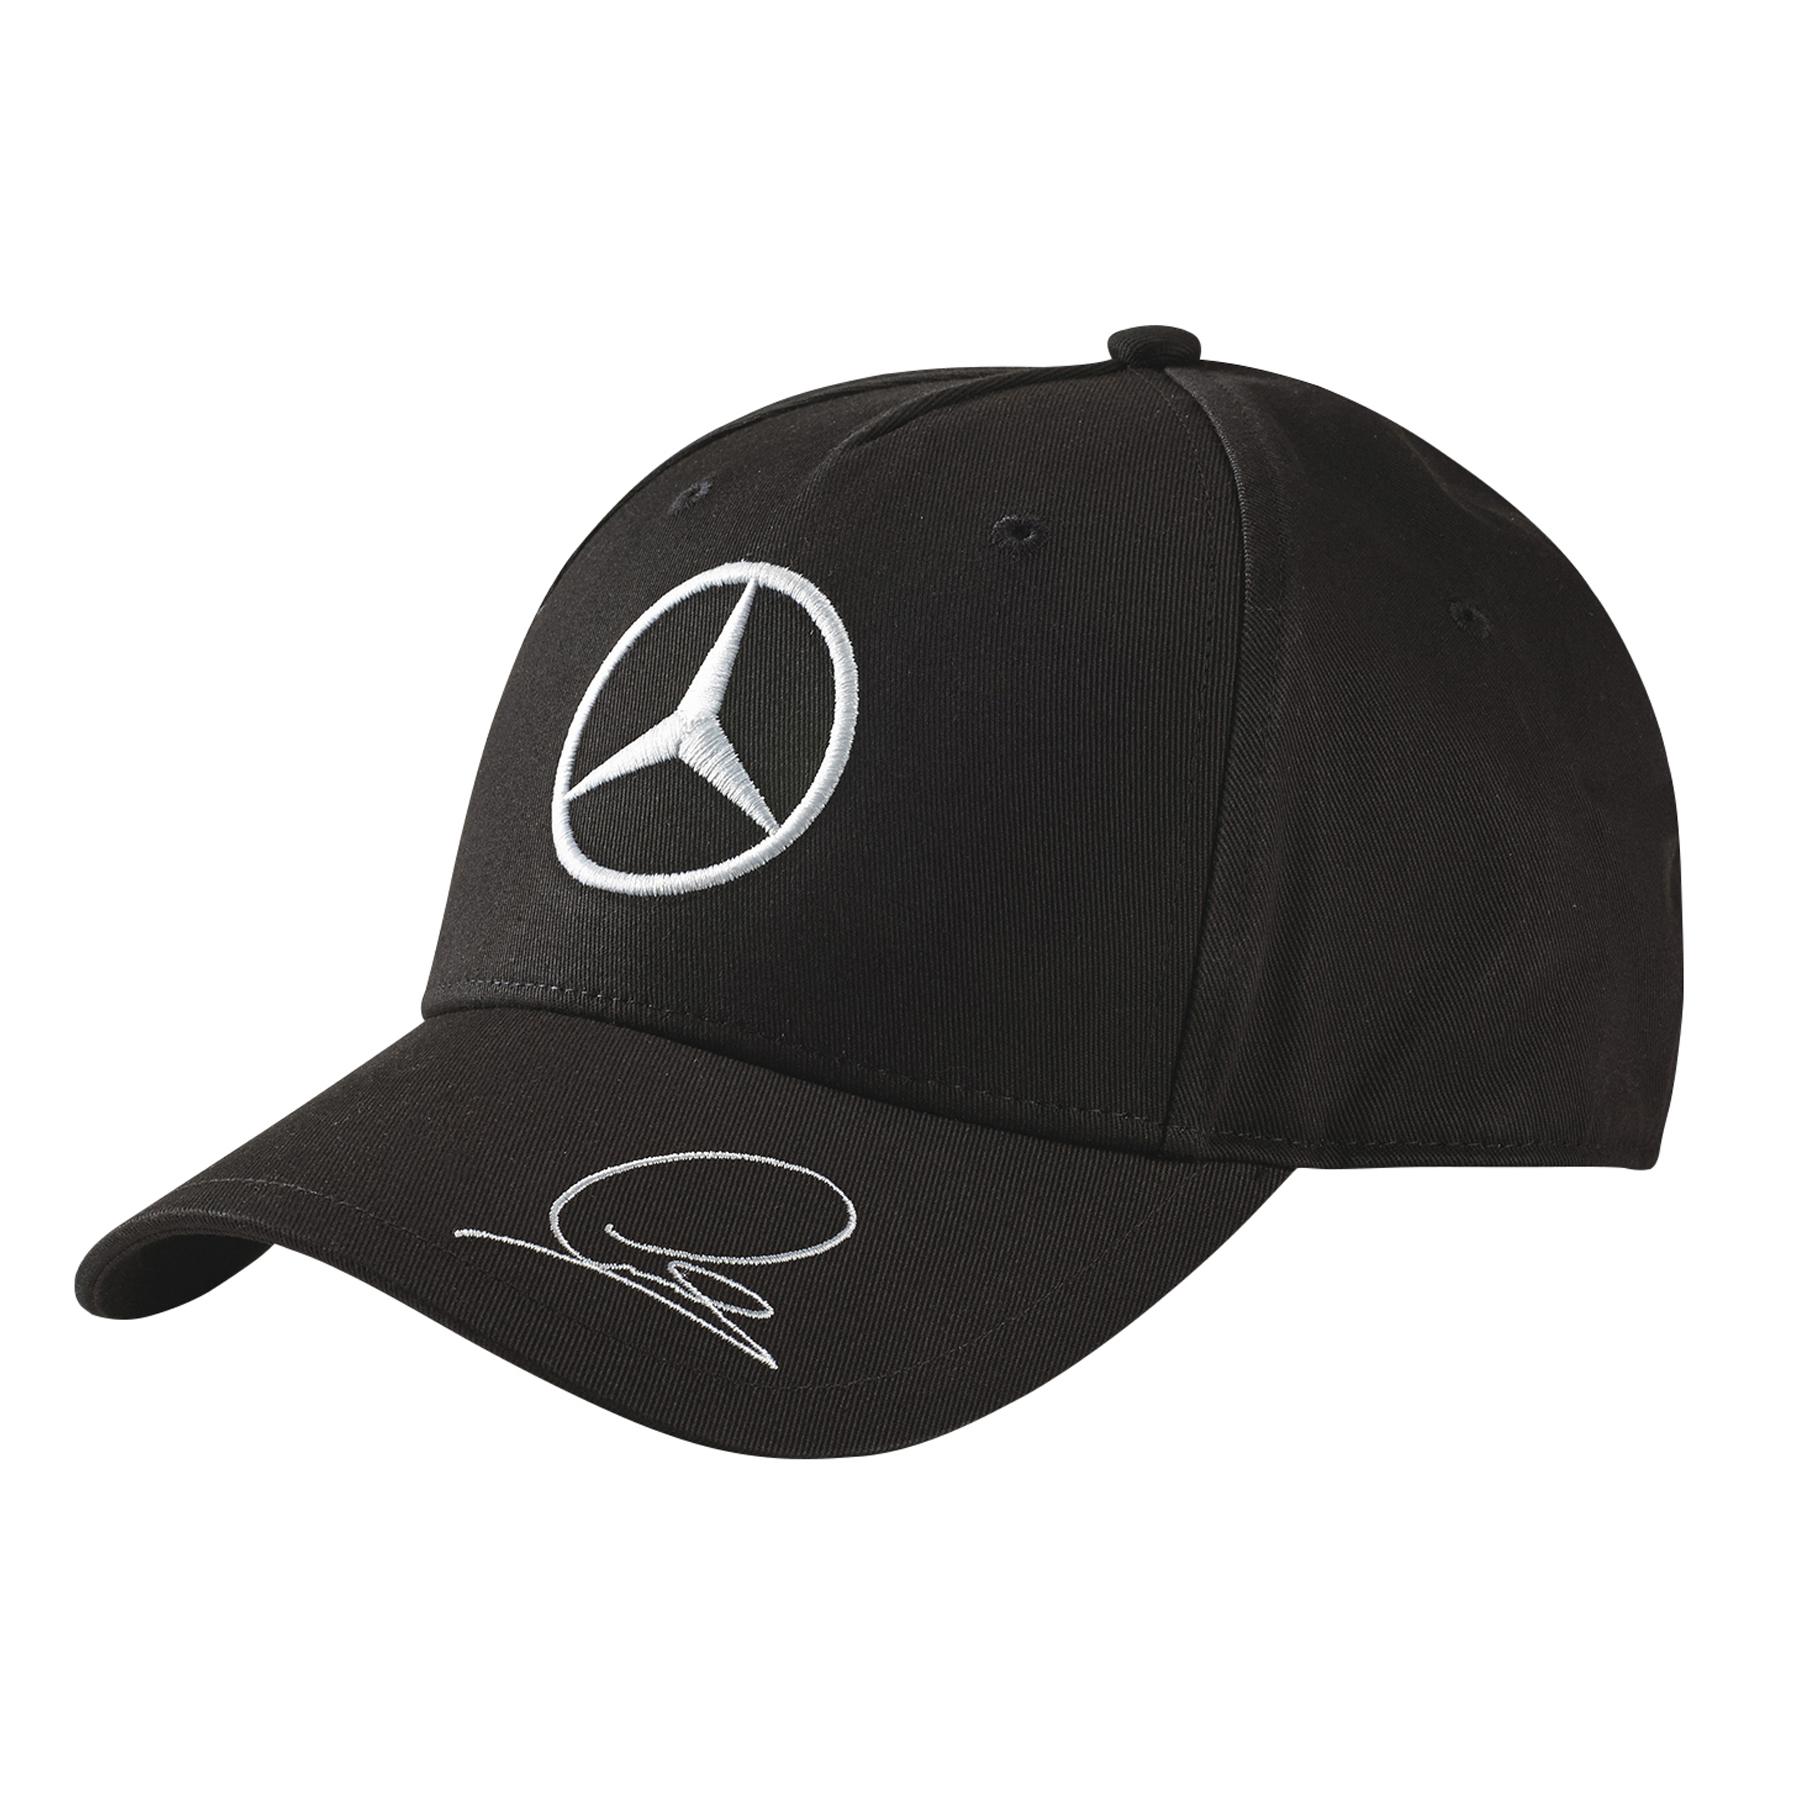 Mercedes amg petronas lewis hamilton cap in black ebay for Mercedes benz amg hat